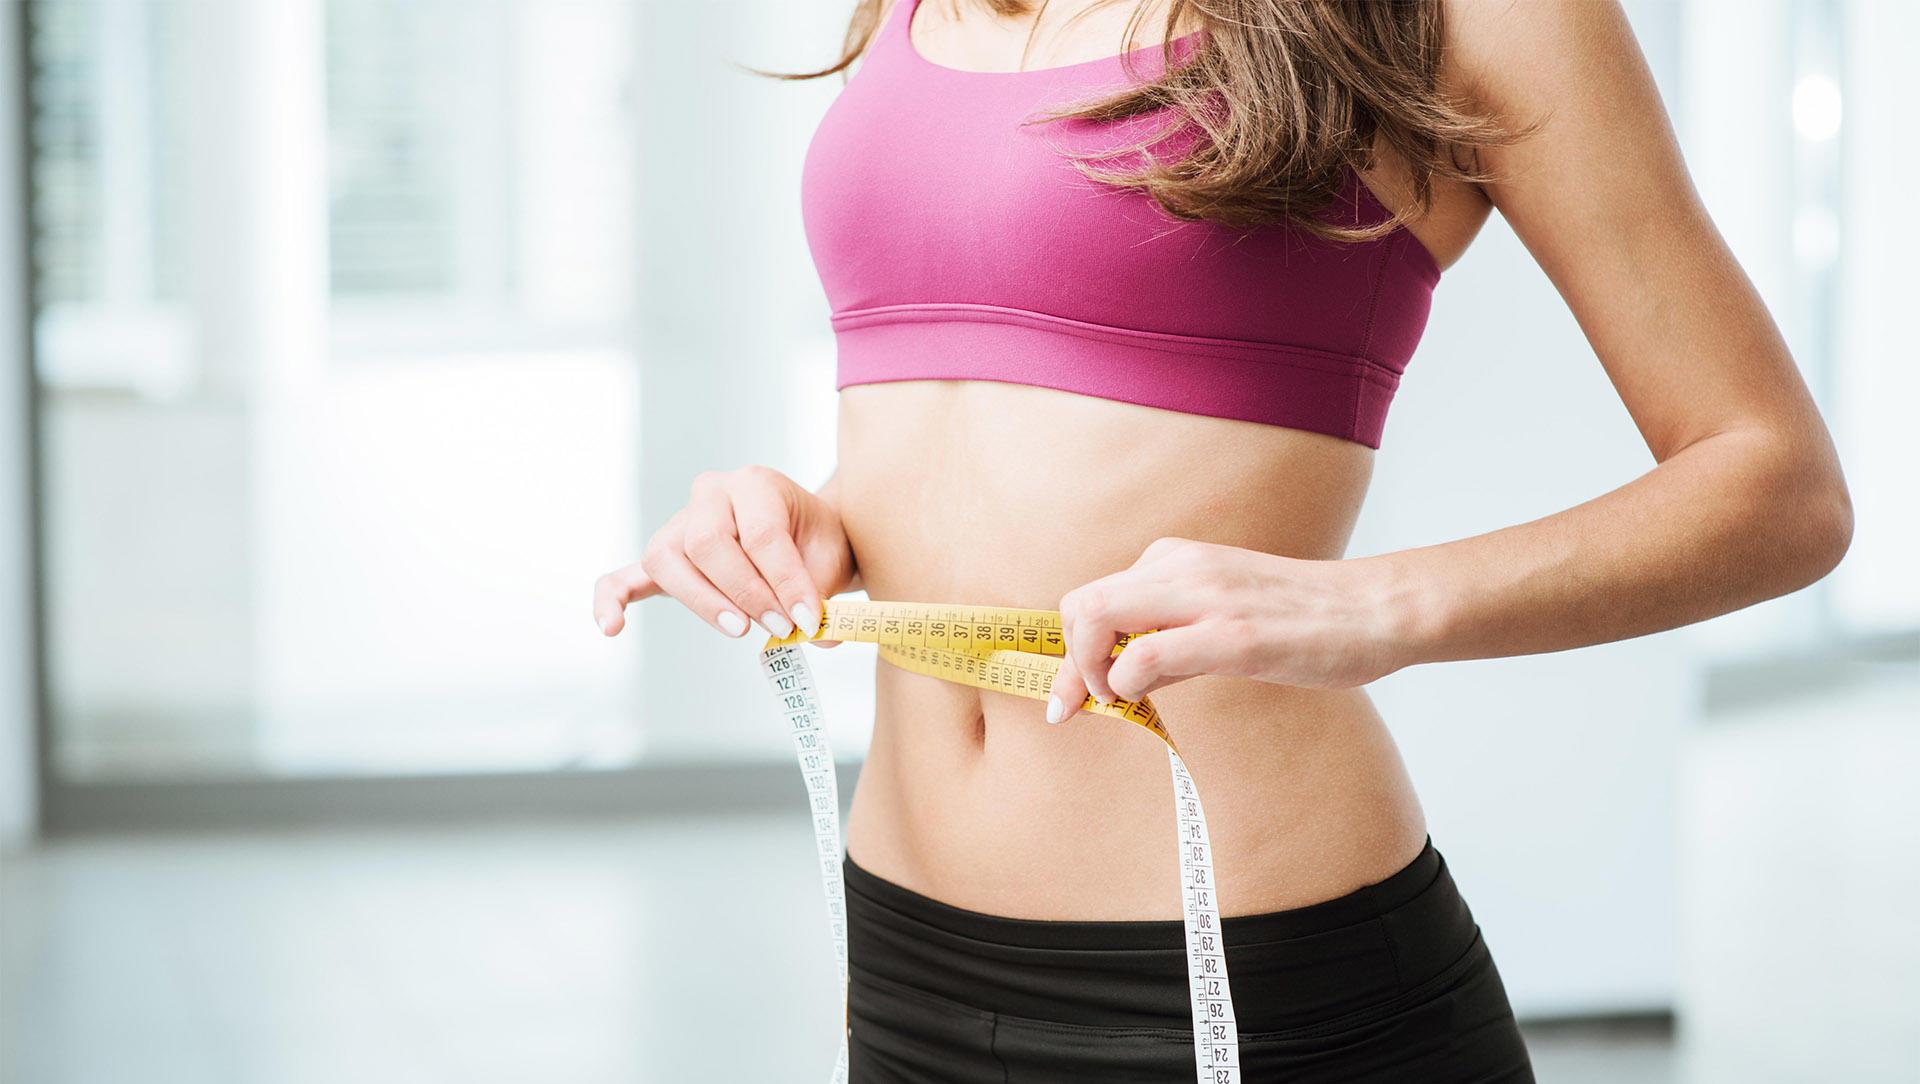 Картинки Про Похудении. Смешные картинки про похудение (15 фото)